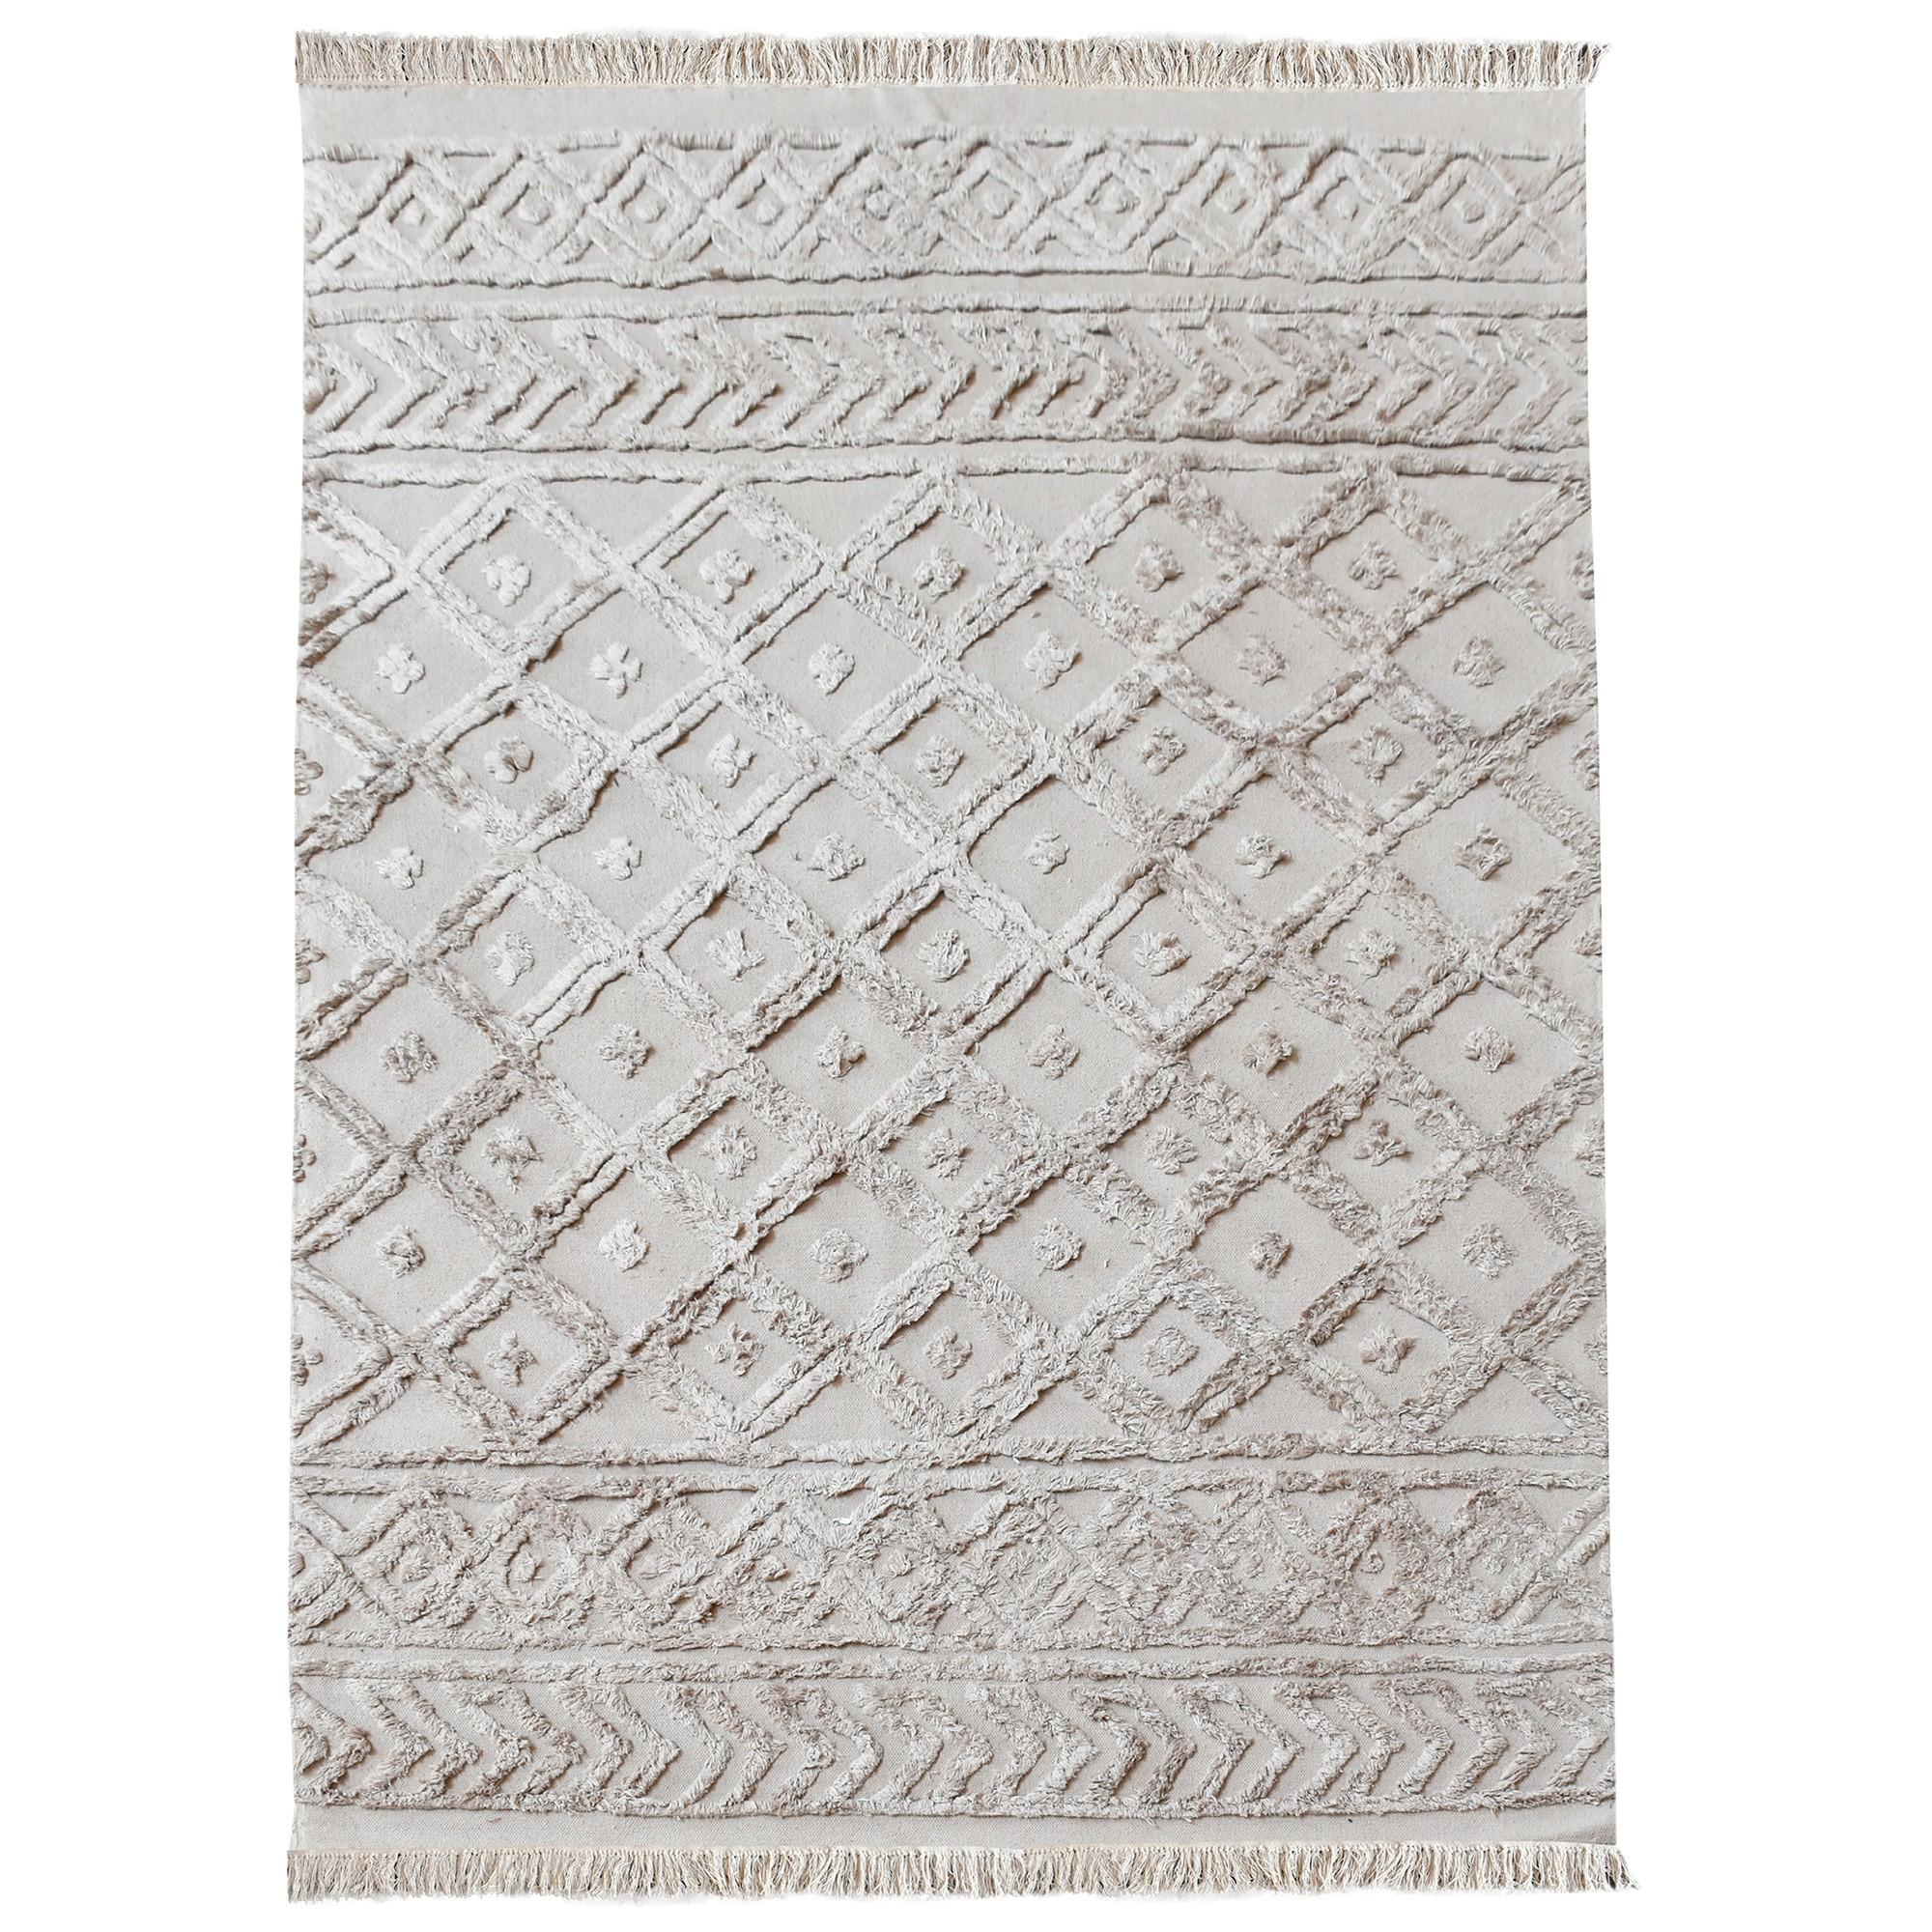 Lison Textured Cotton Rug, 160x230cm